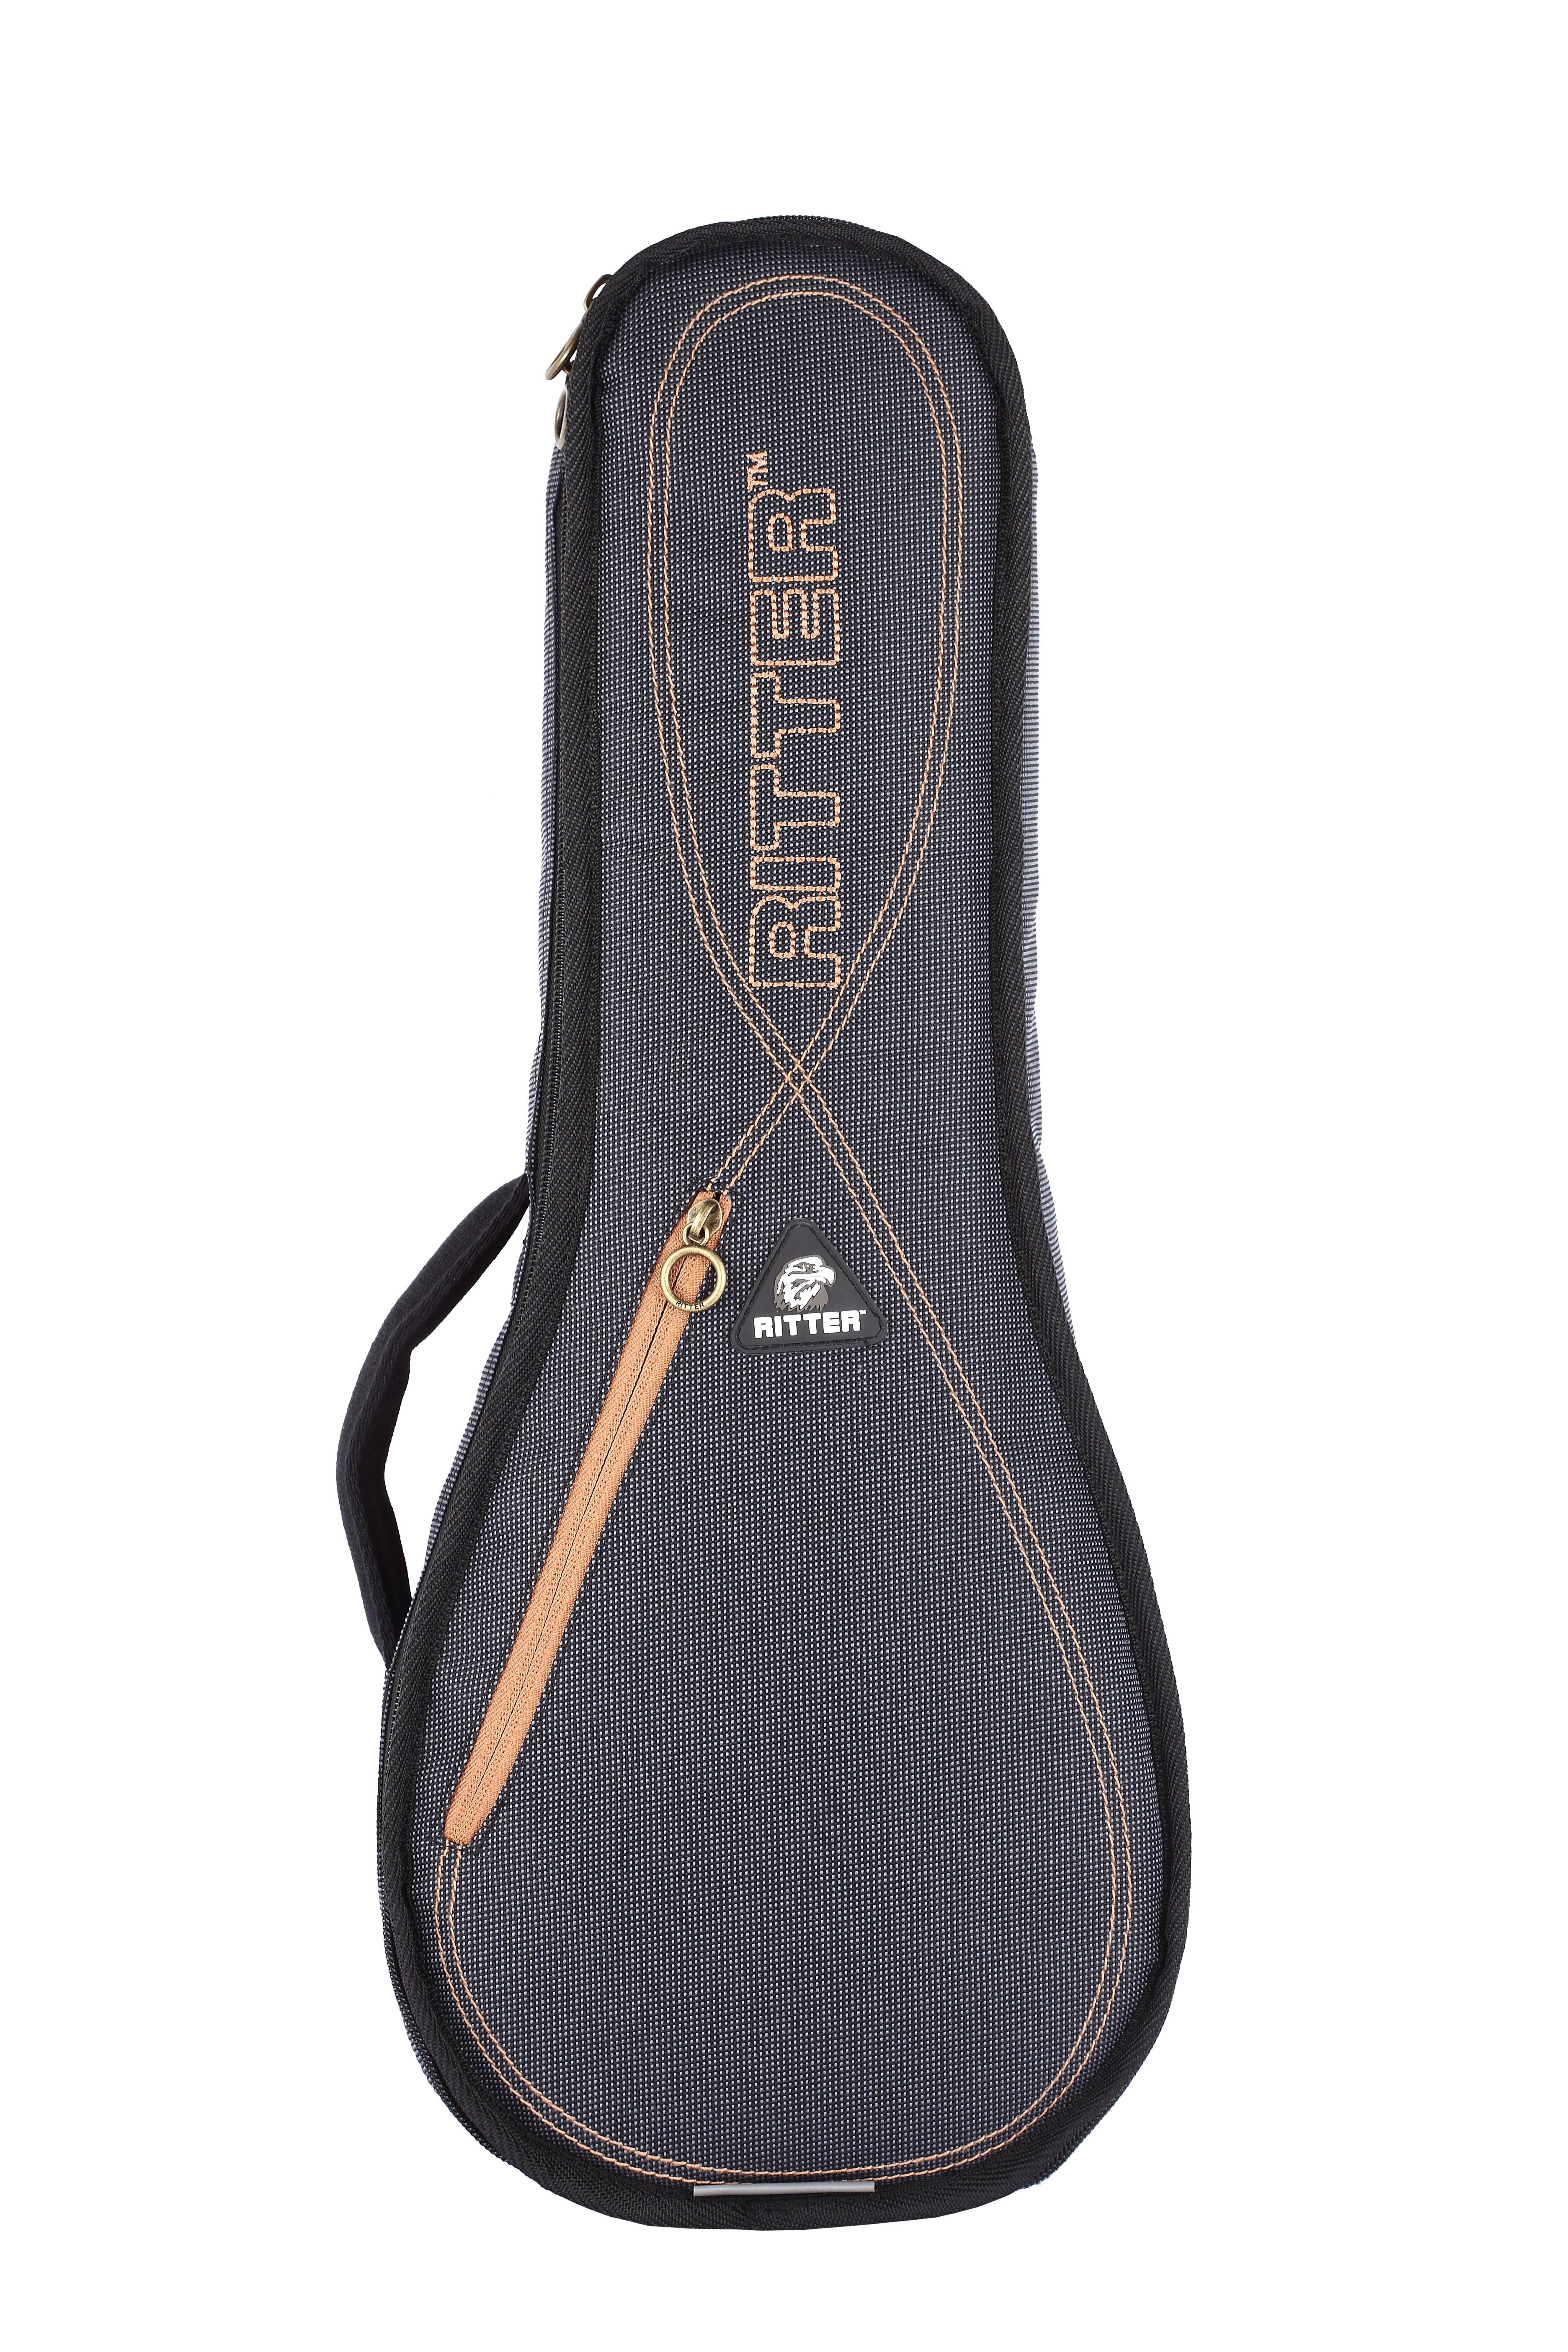 Ritter RGS3-UT/MGB Tenor Ukulele Bag - Misty Grey/Brown